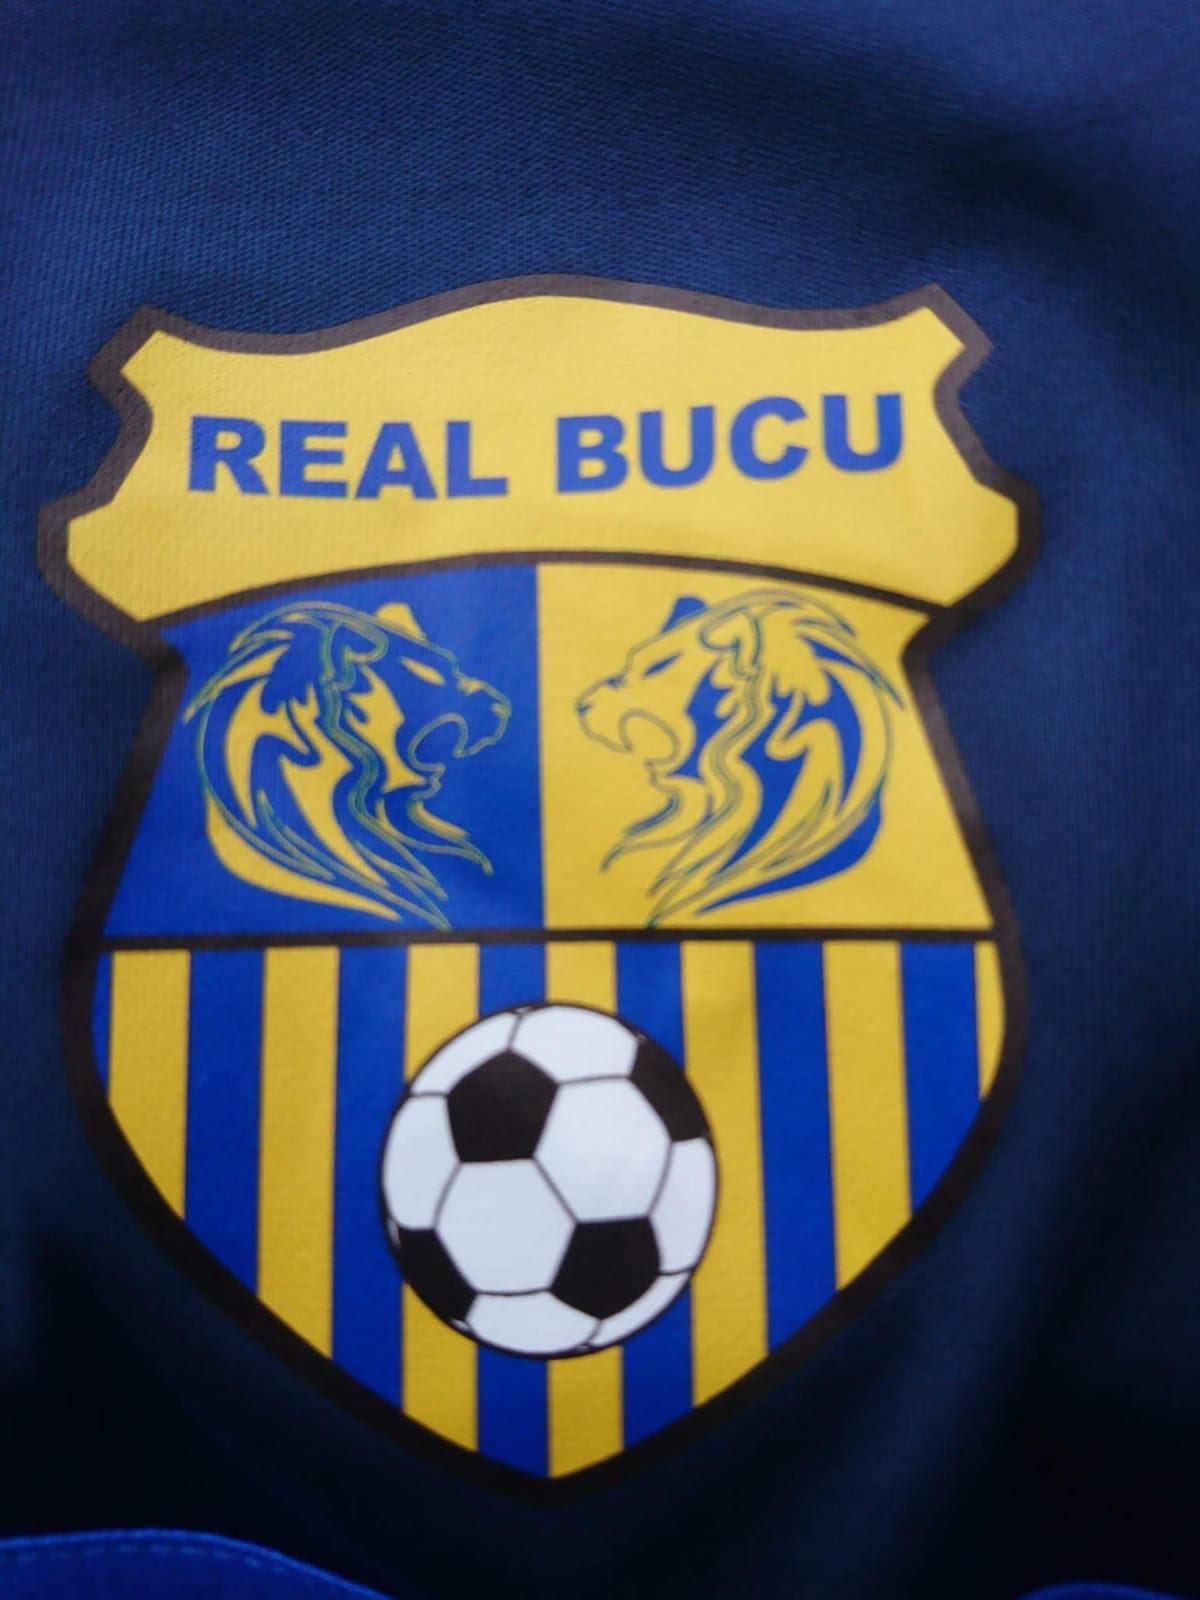 Real Bucu